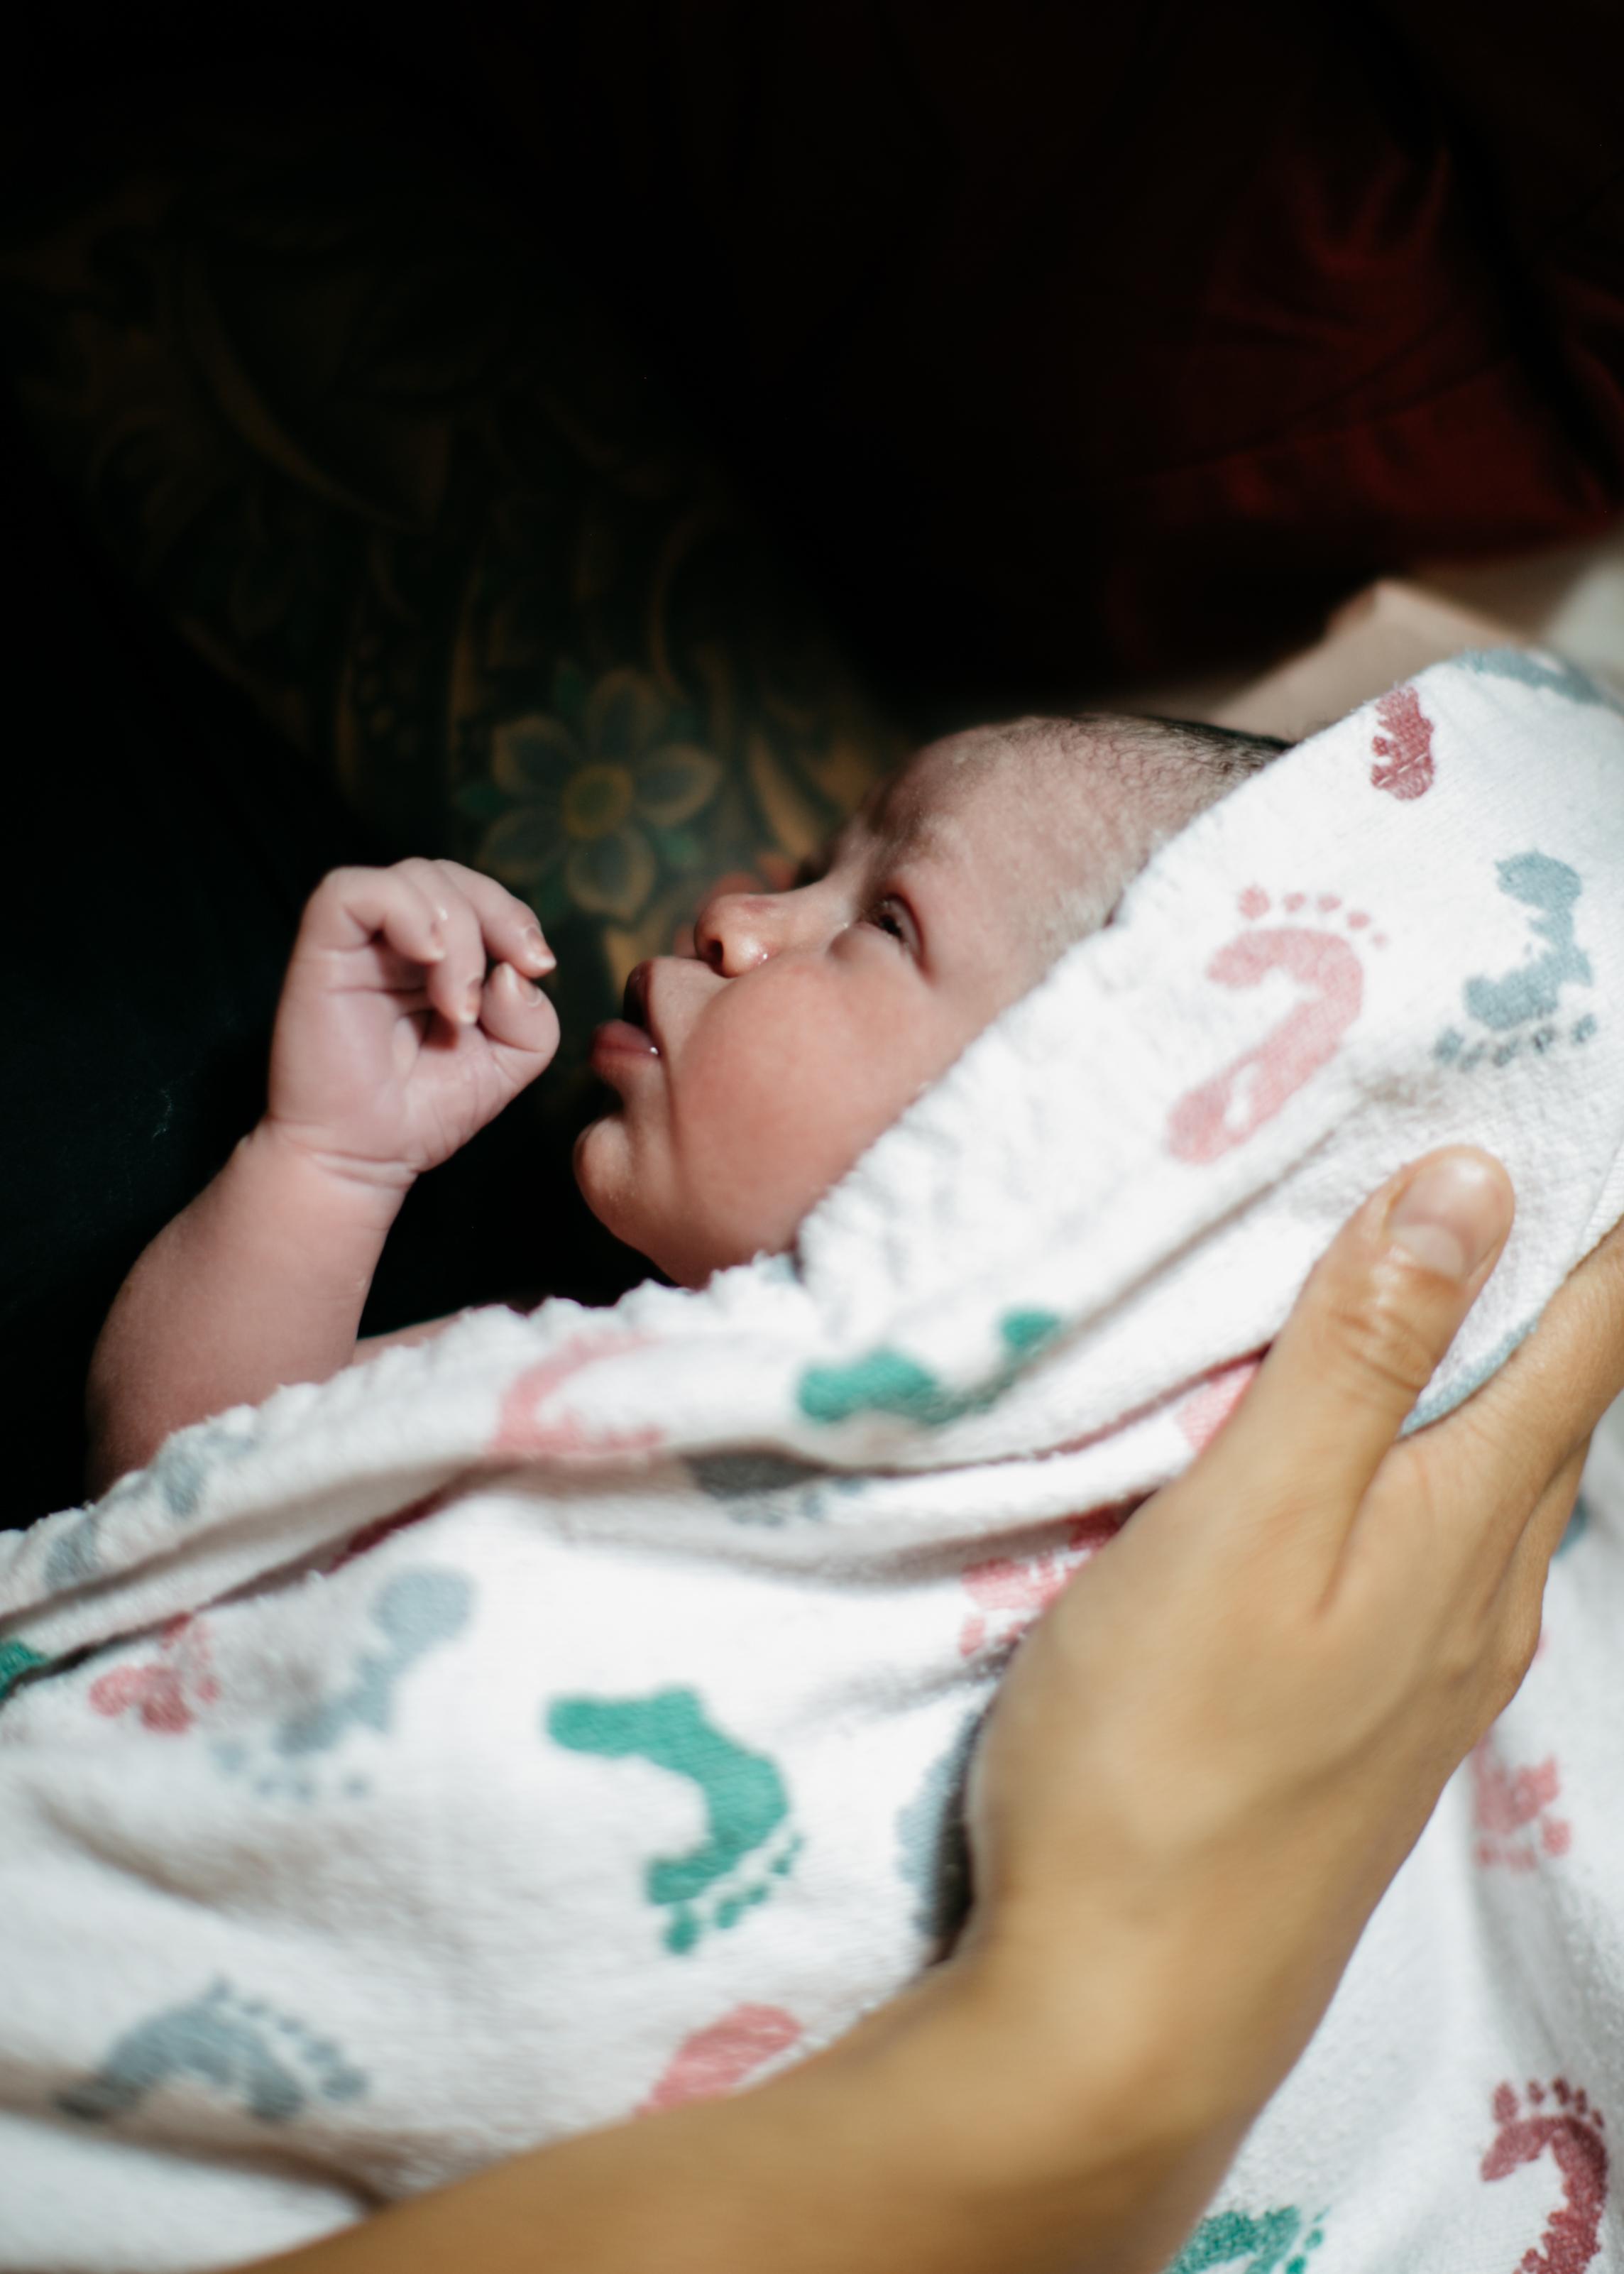 elan-photographie-studio-birth-photography-180.jpg